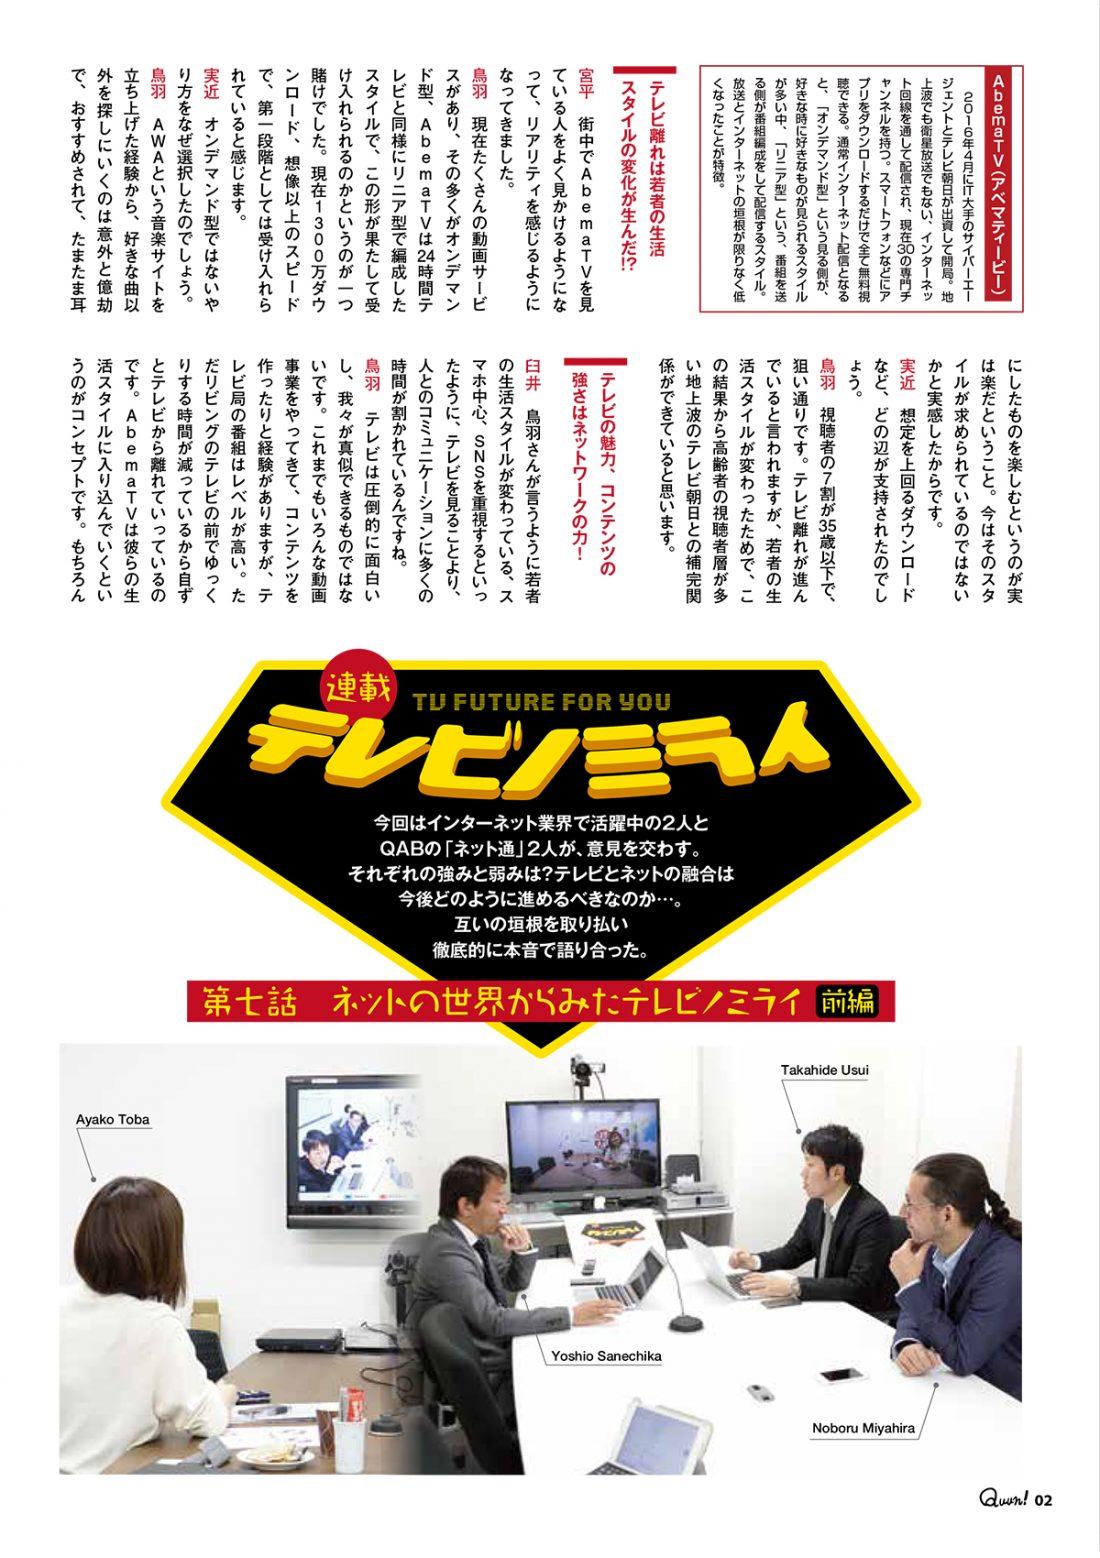 https://www.qab.co.jp/qgoro/wp-content/uploads/quun_0704-1100x1558.jpg